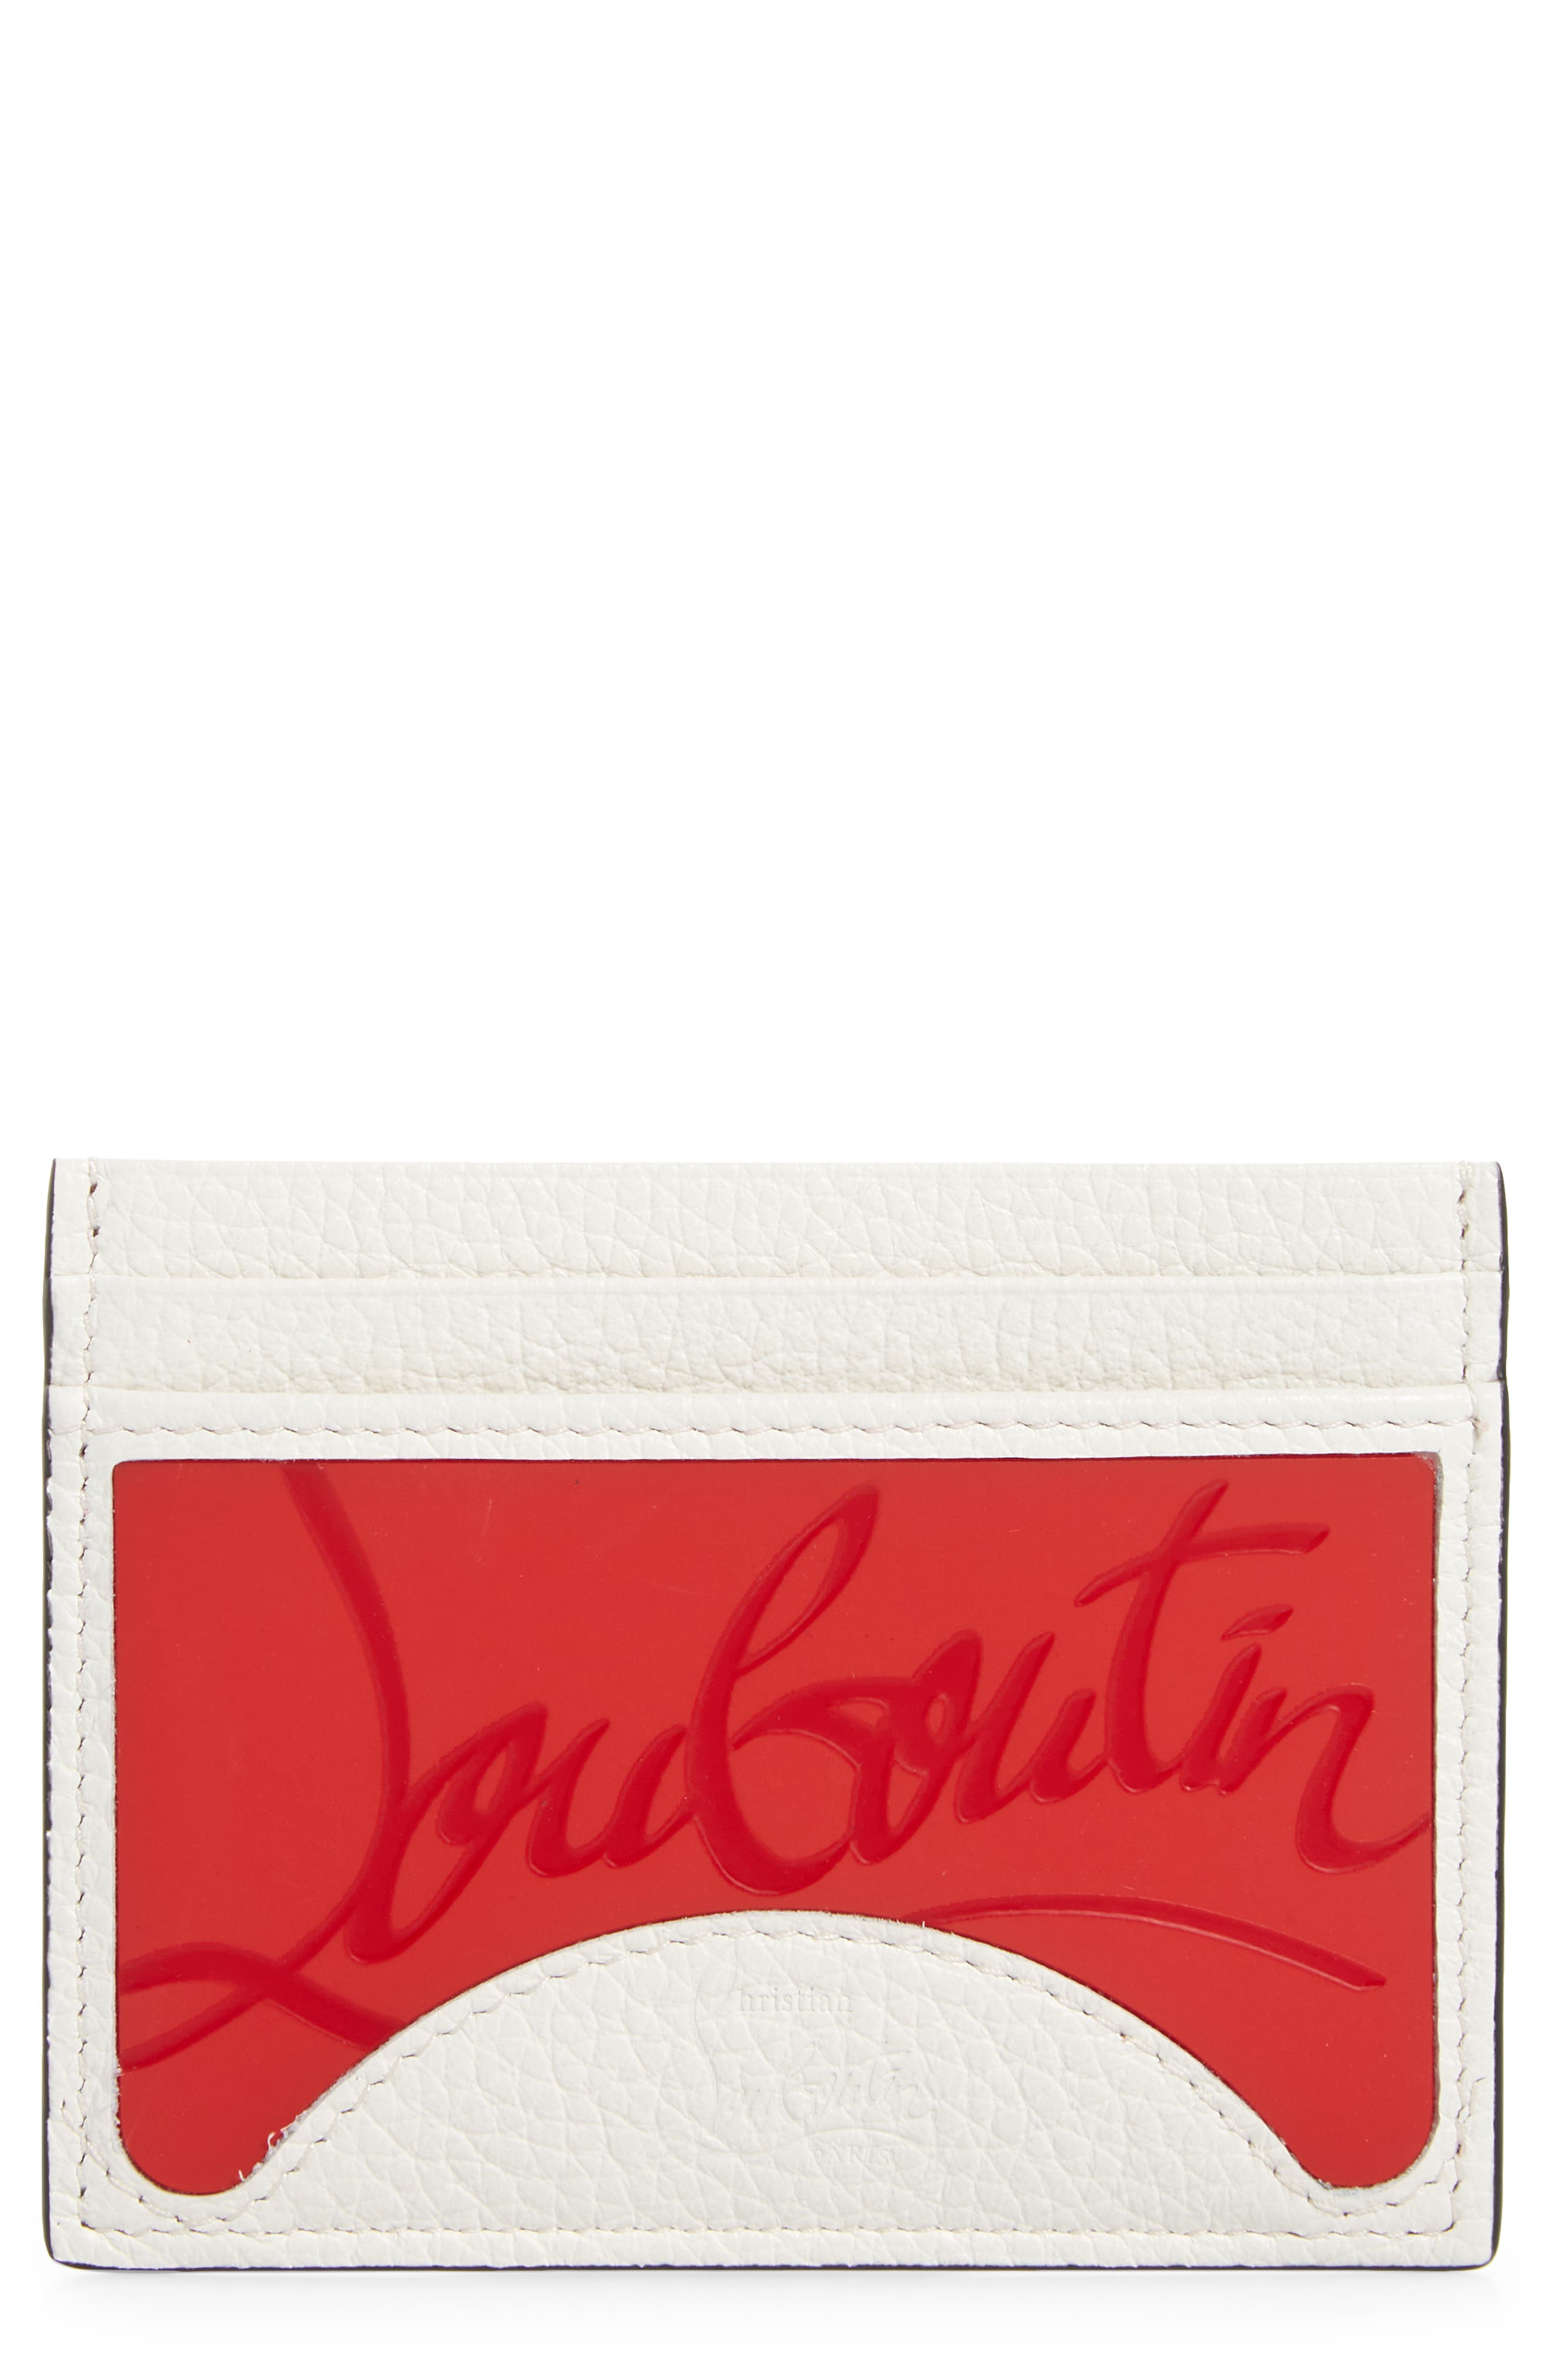 Kios Sneaker Sole Leather & Tpu Card Case